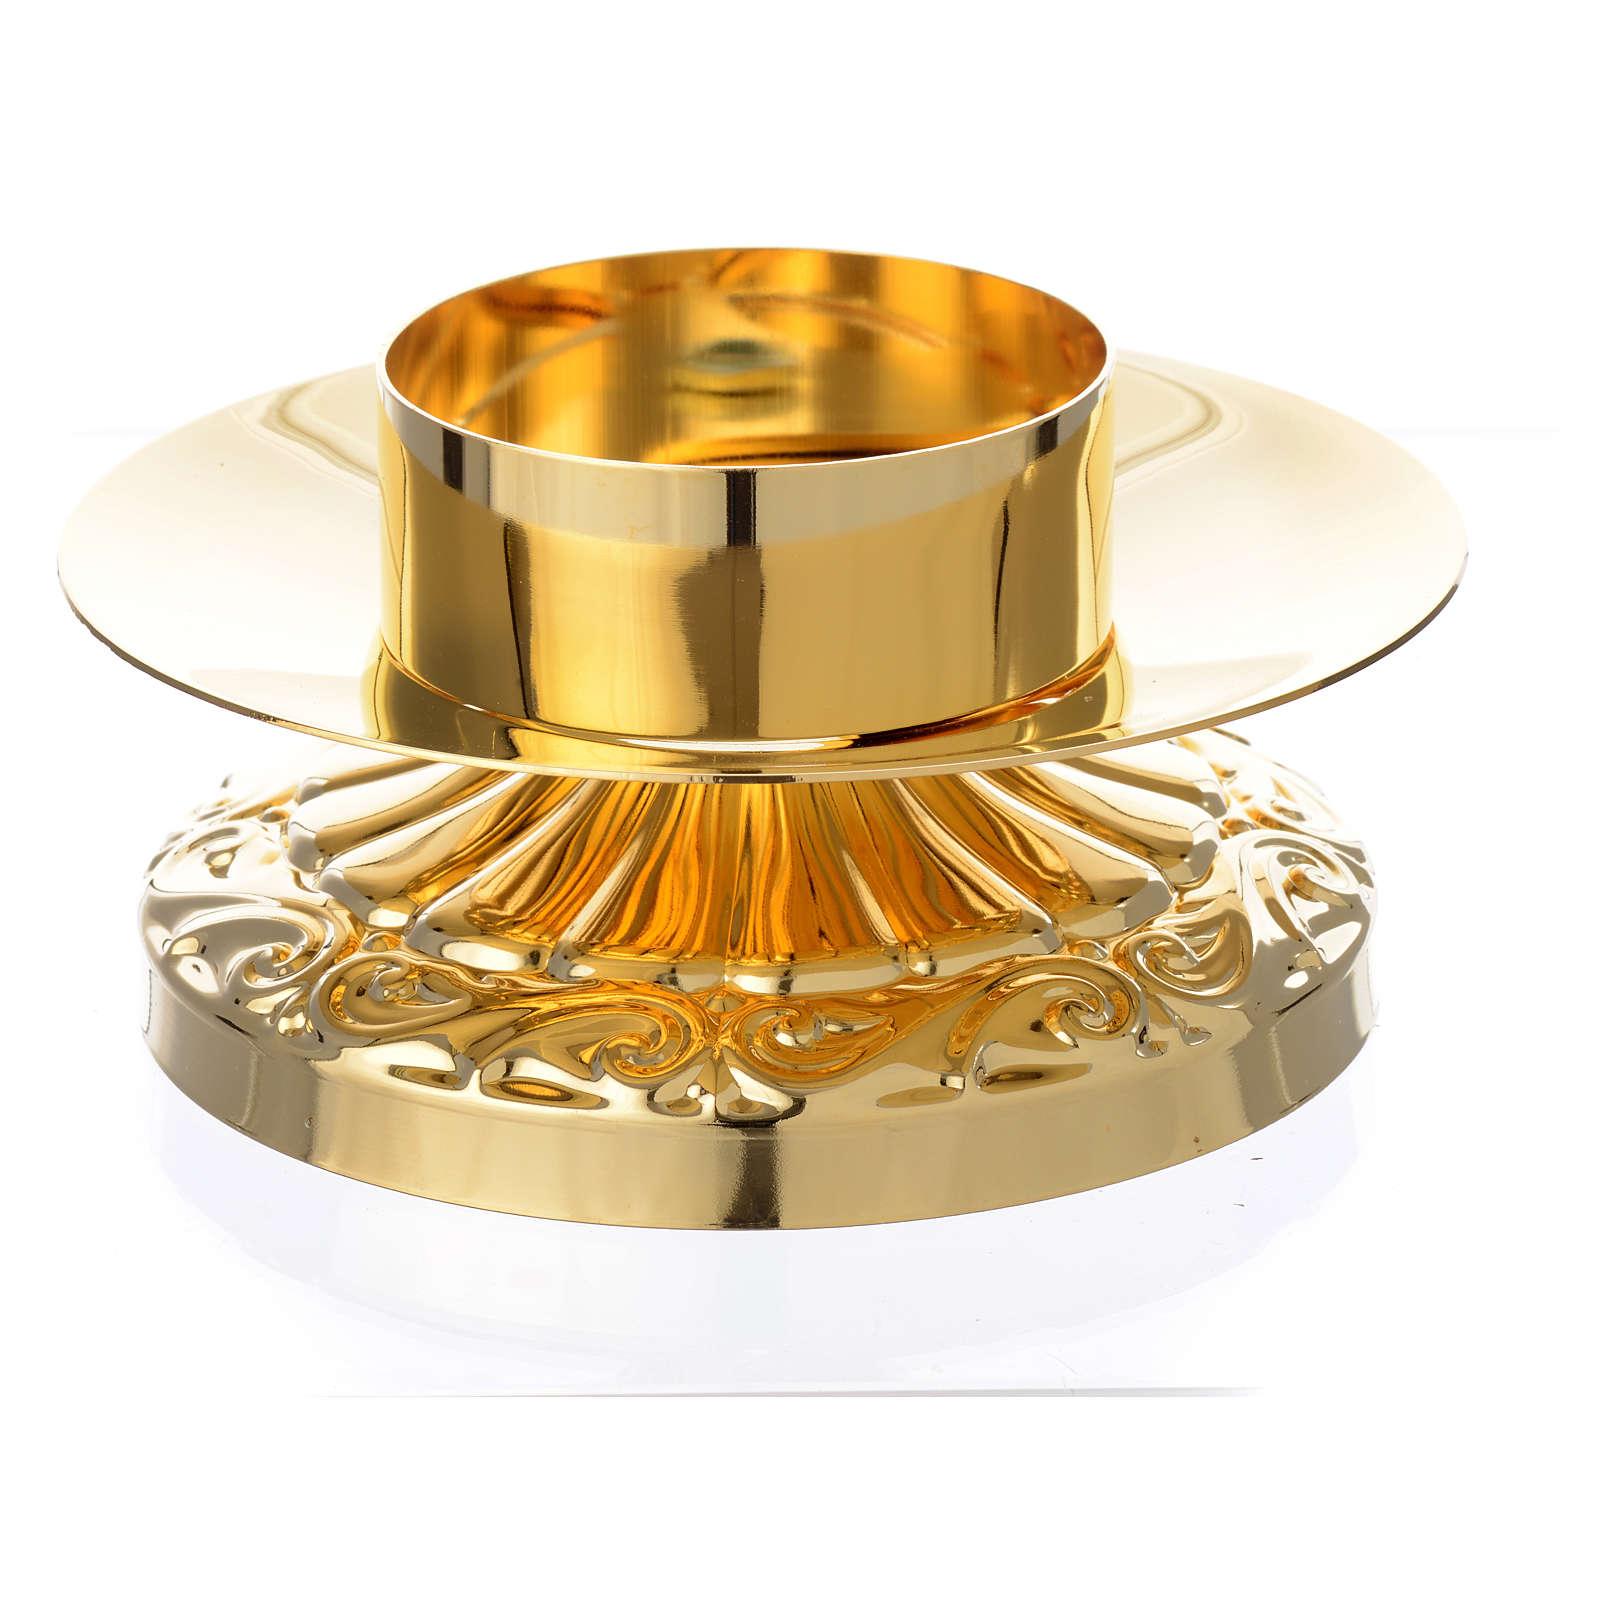 Chandelier empire en laiton doré 4